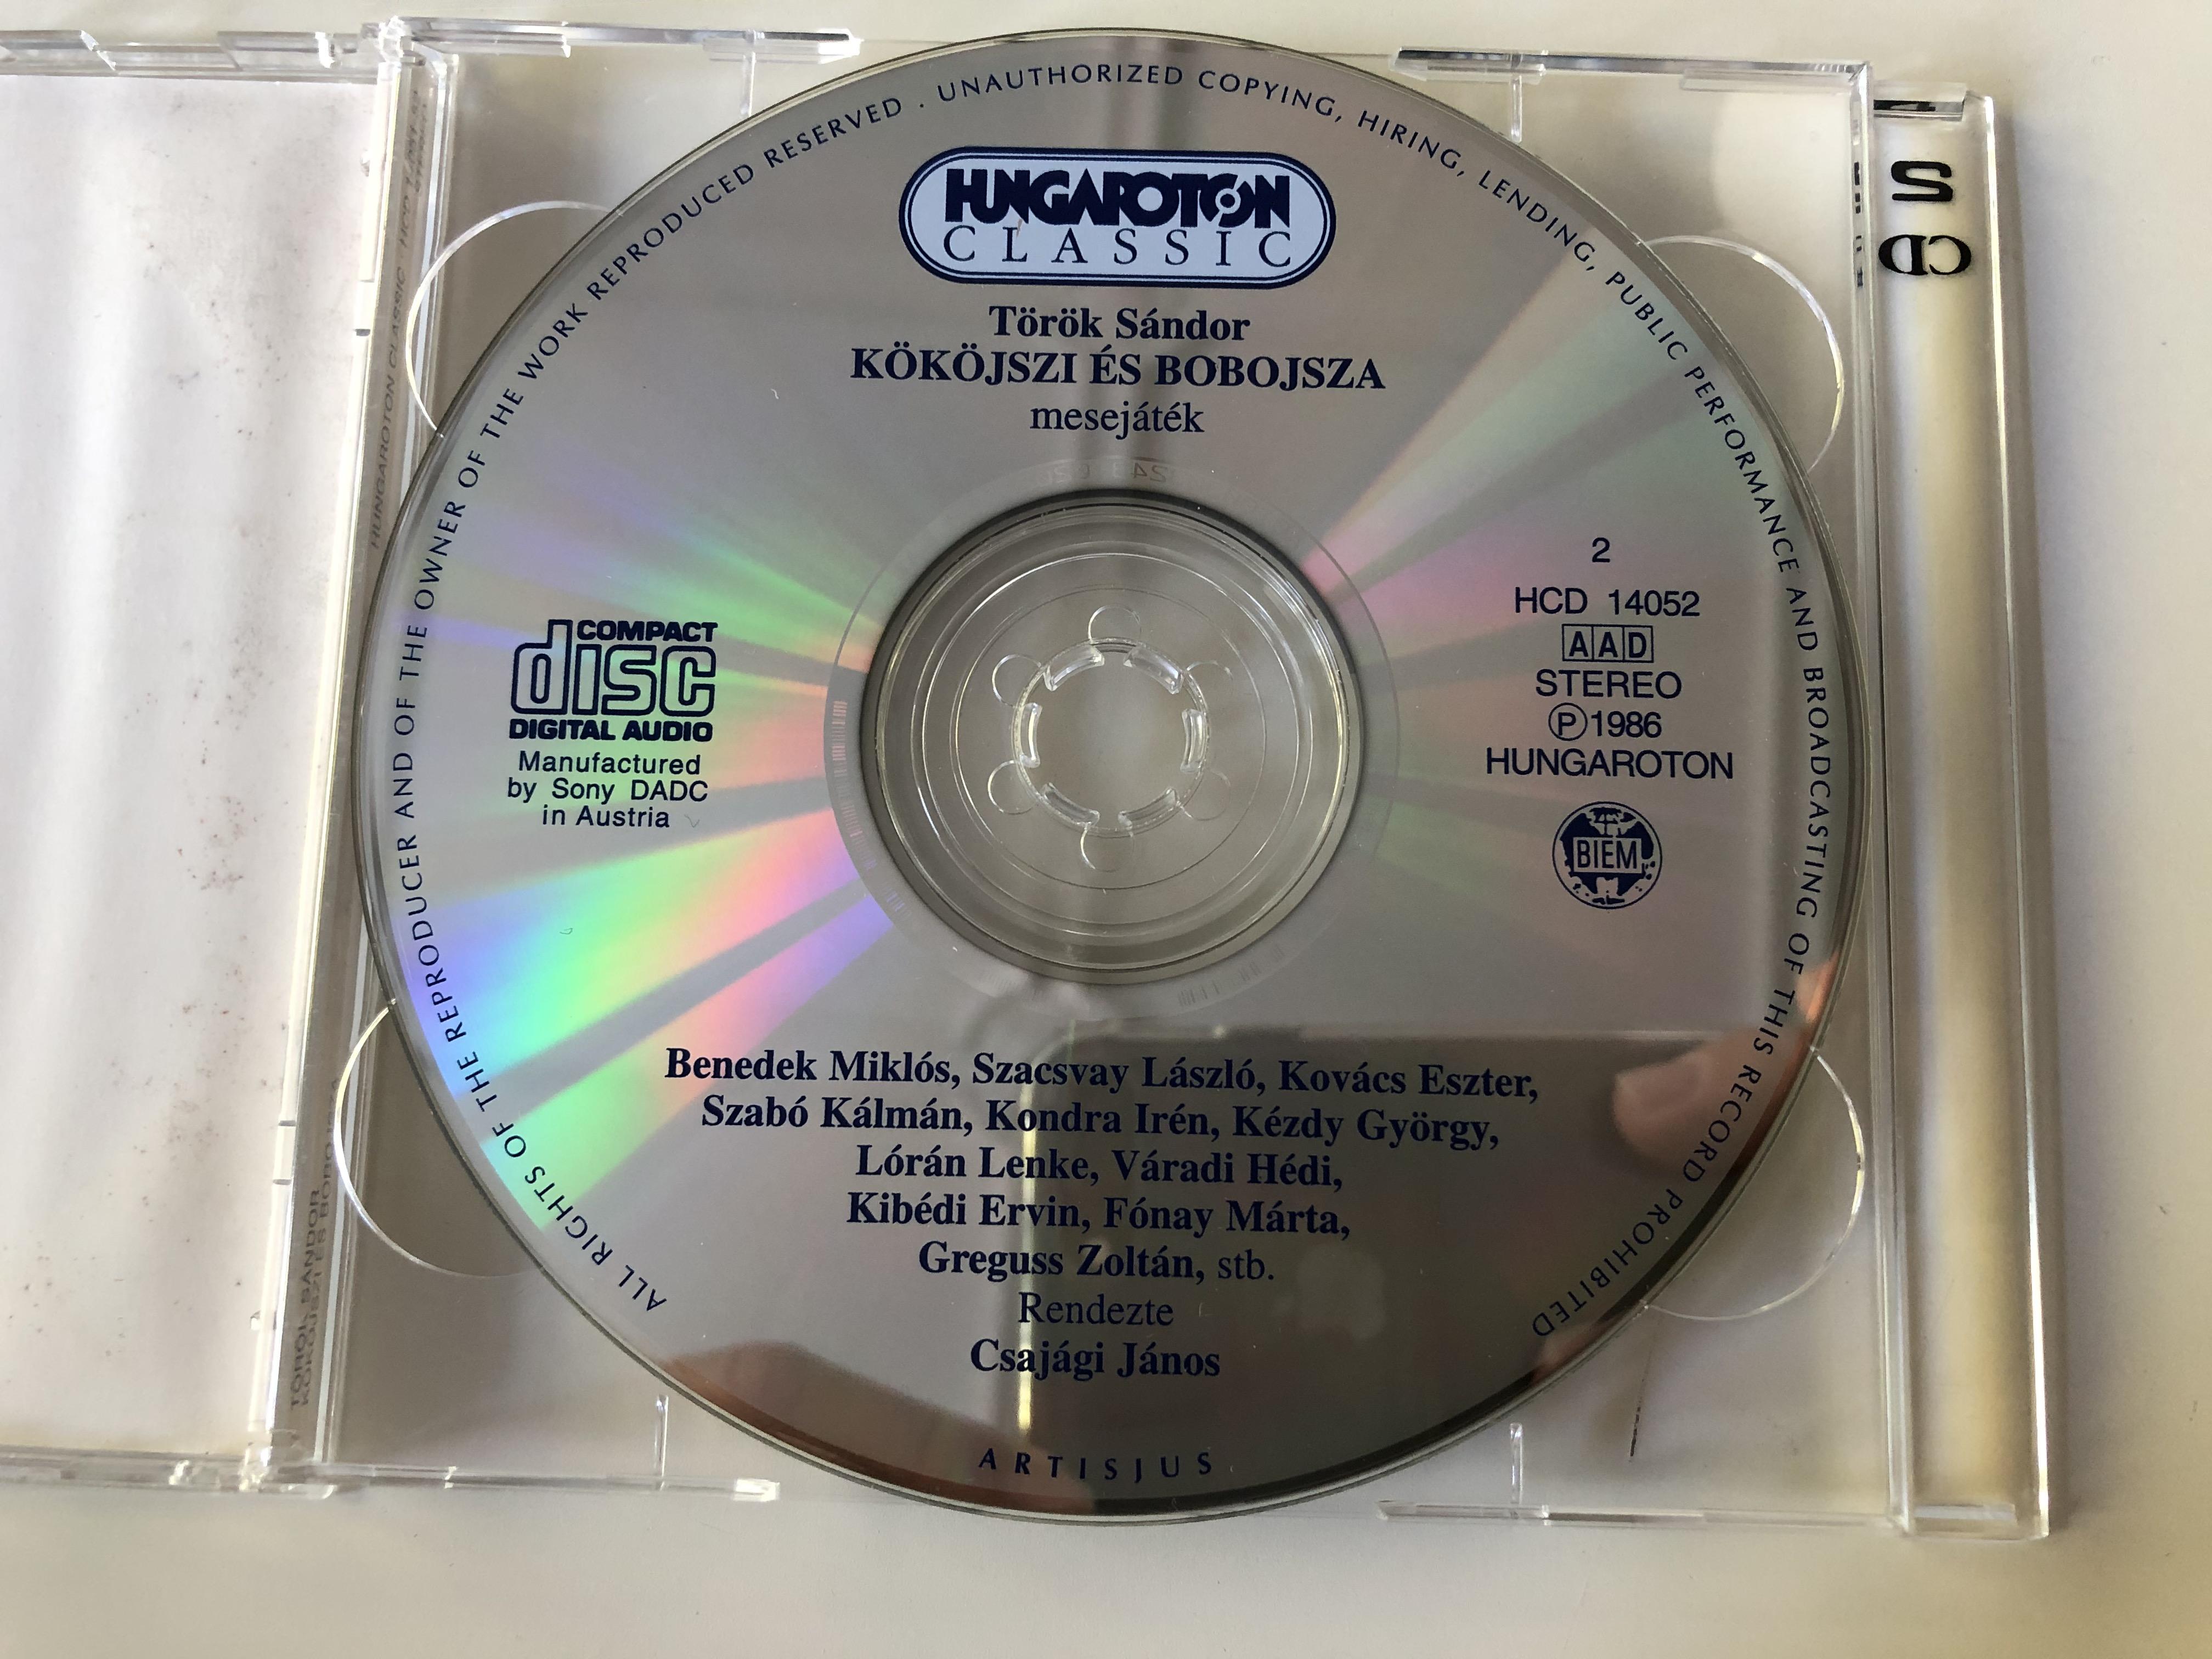 t-r-k-sandor-k-k-jszi-s-bobojsza-hungaroton-classic-2x-audio-cd-1999-stereo-hcd-14051-52-2-.jpg